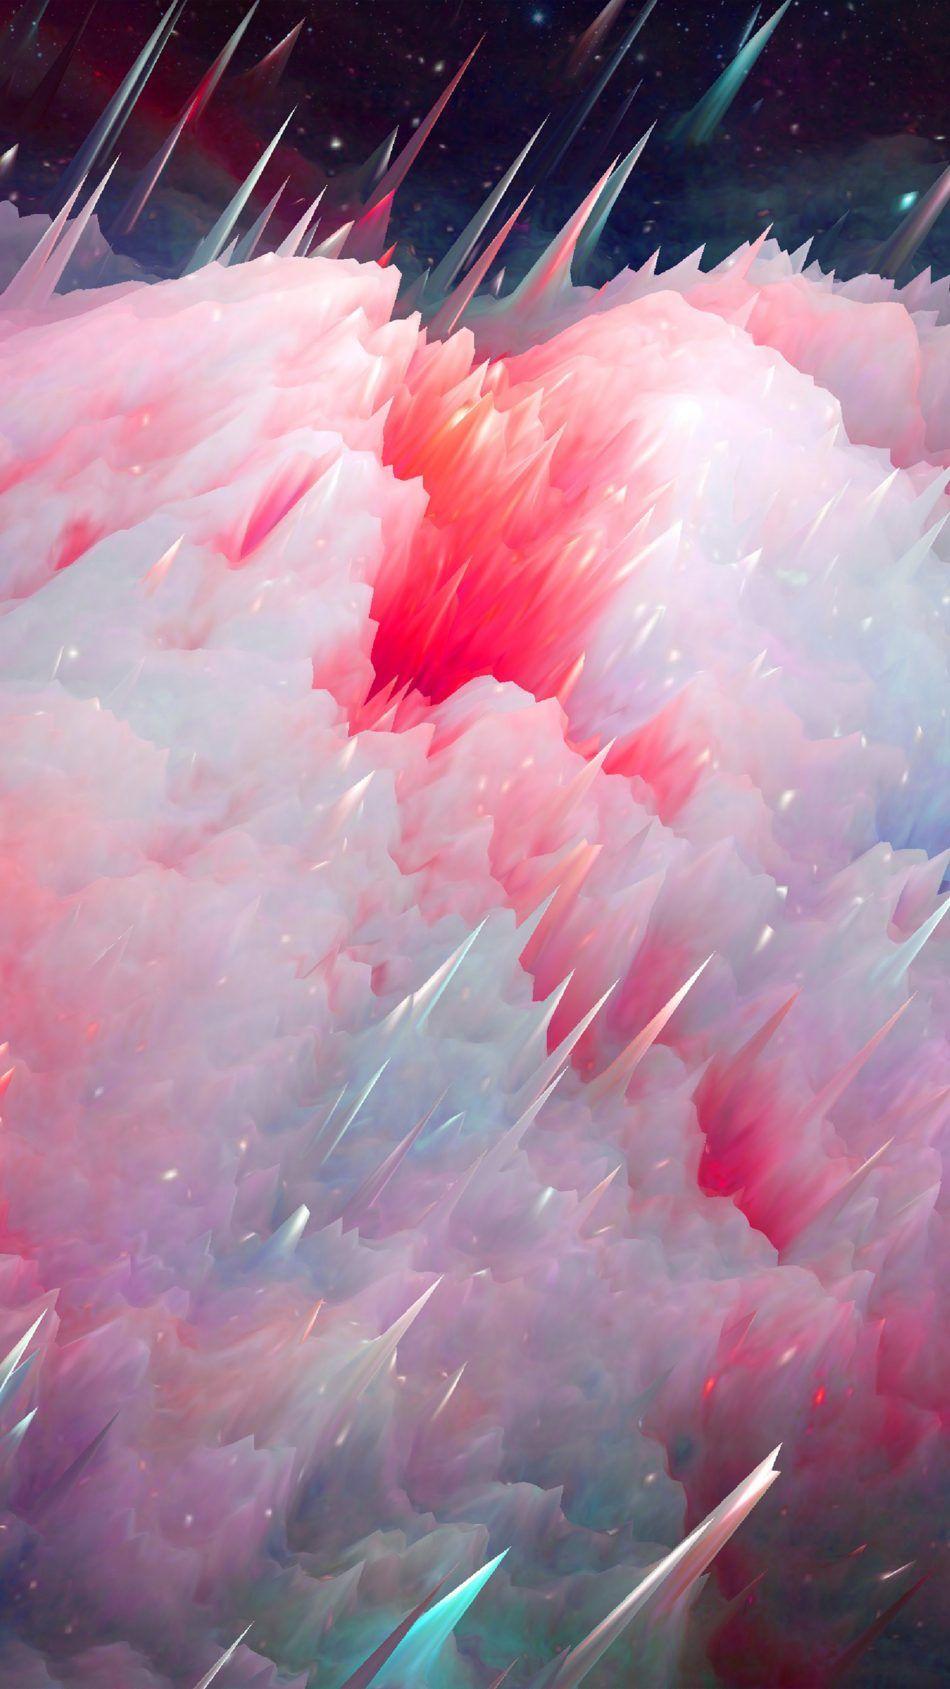 Nebula Colorful Explosion Graphics Original Iphone Wallpaper